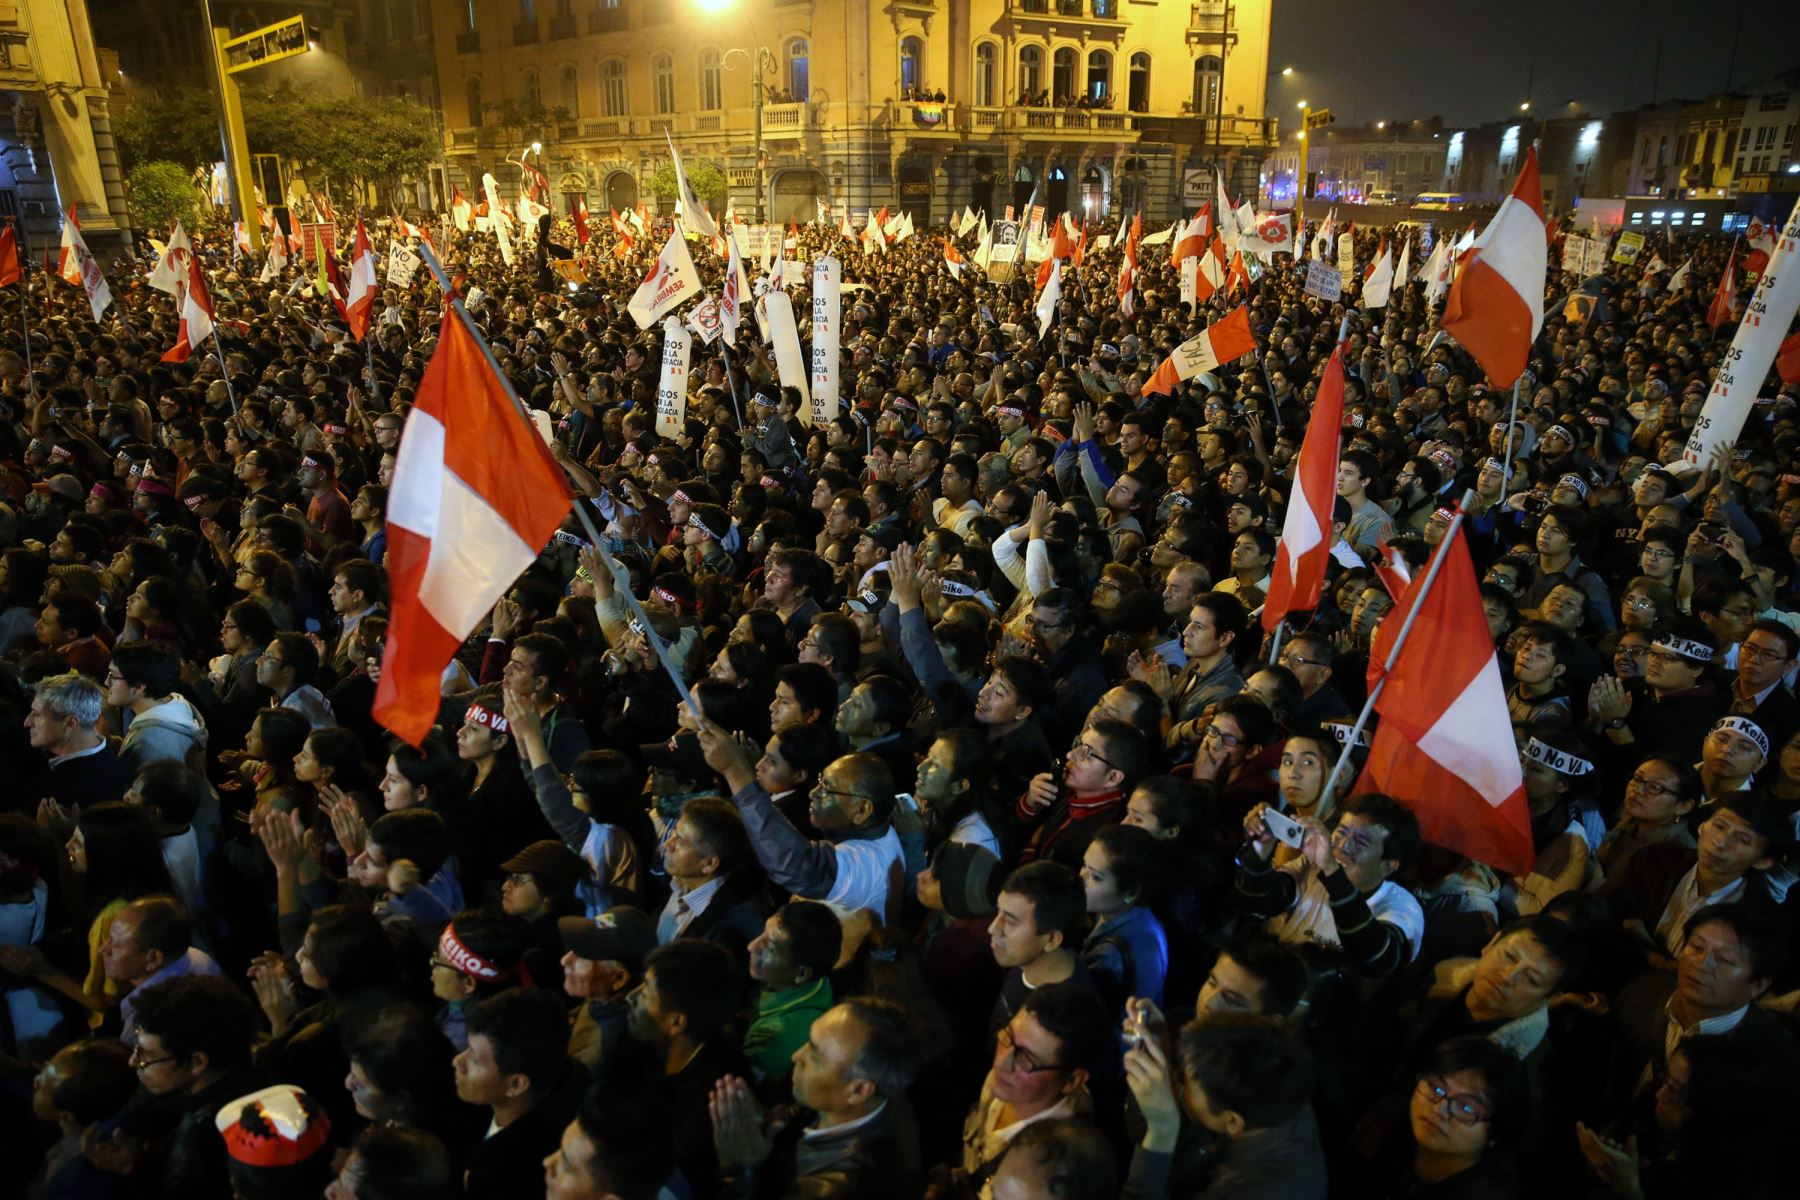 Concurrida marcha contraria a candidatura de Keiko Fujimori, se movilizaron por el centro de Lima. ANDINA/Vidal Tarqui